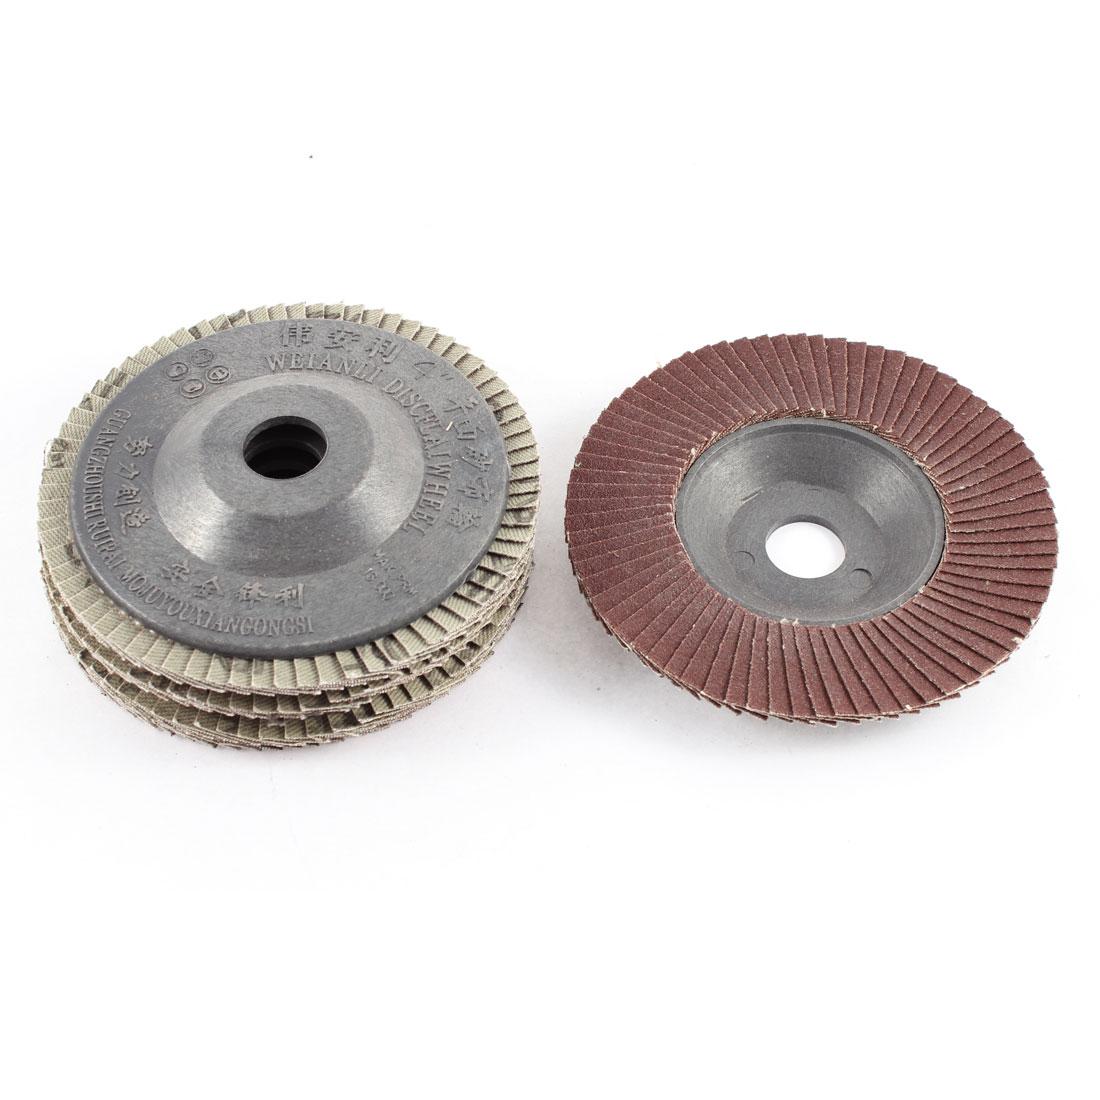 "Stainless Steel Metal 4"" x 5/8"" Flap Sanding Discs Grinding Wheel 240 Grit 5pcs"